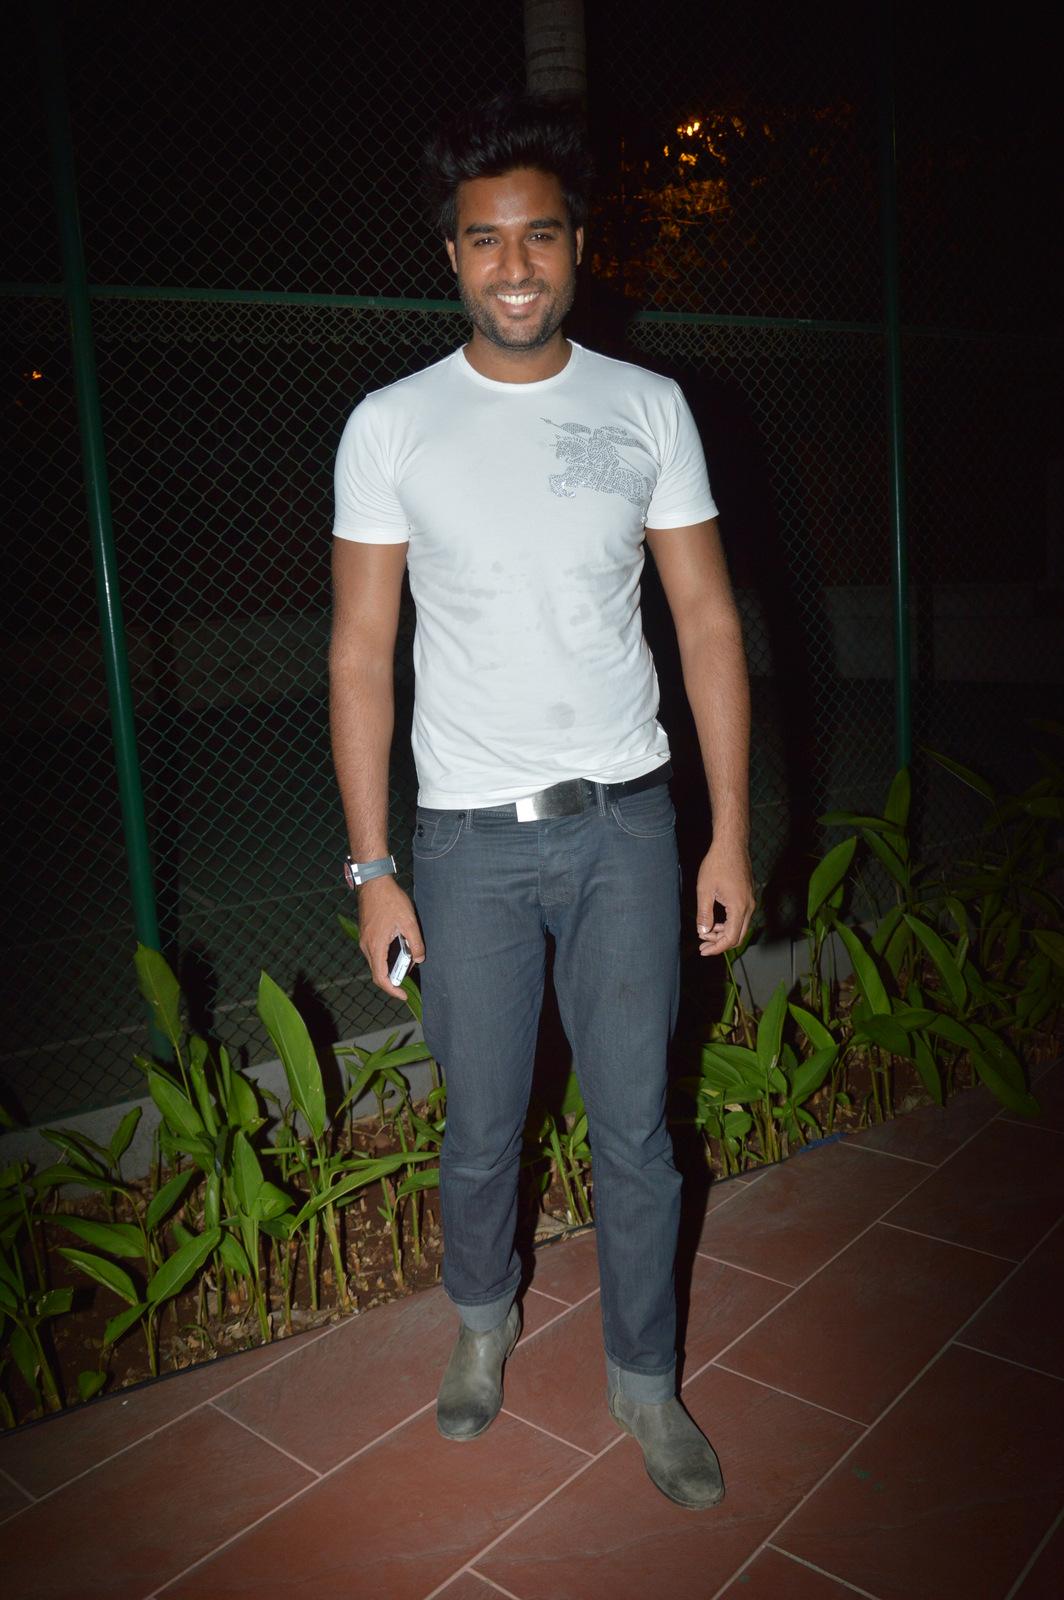 Model-actor Rameshwar Singh